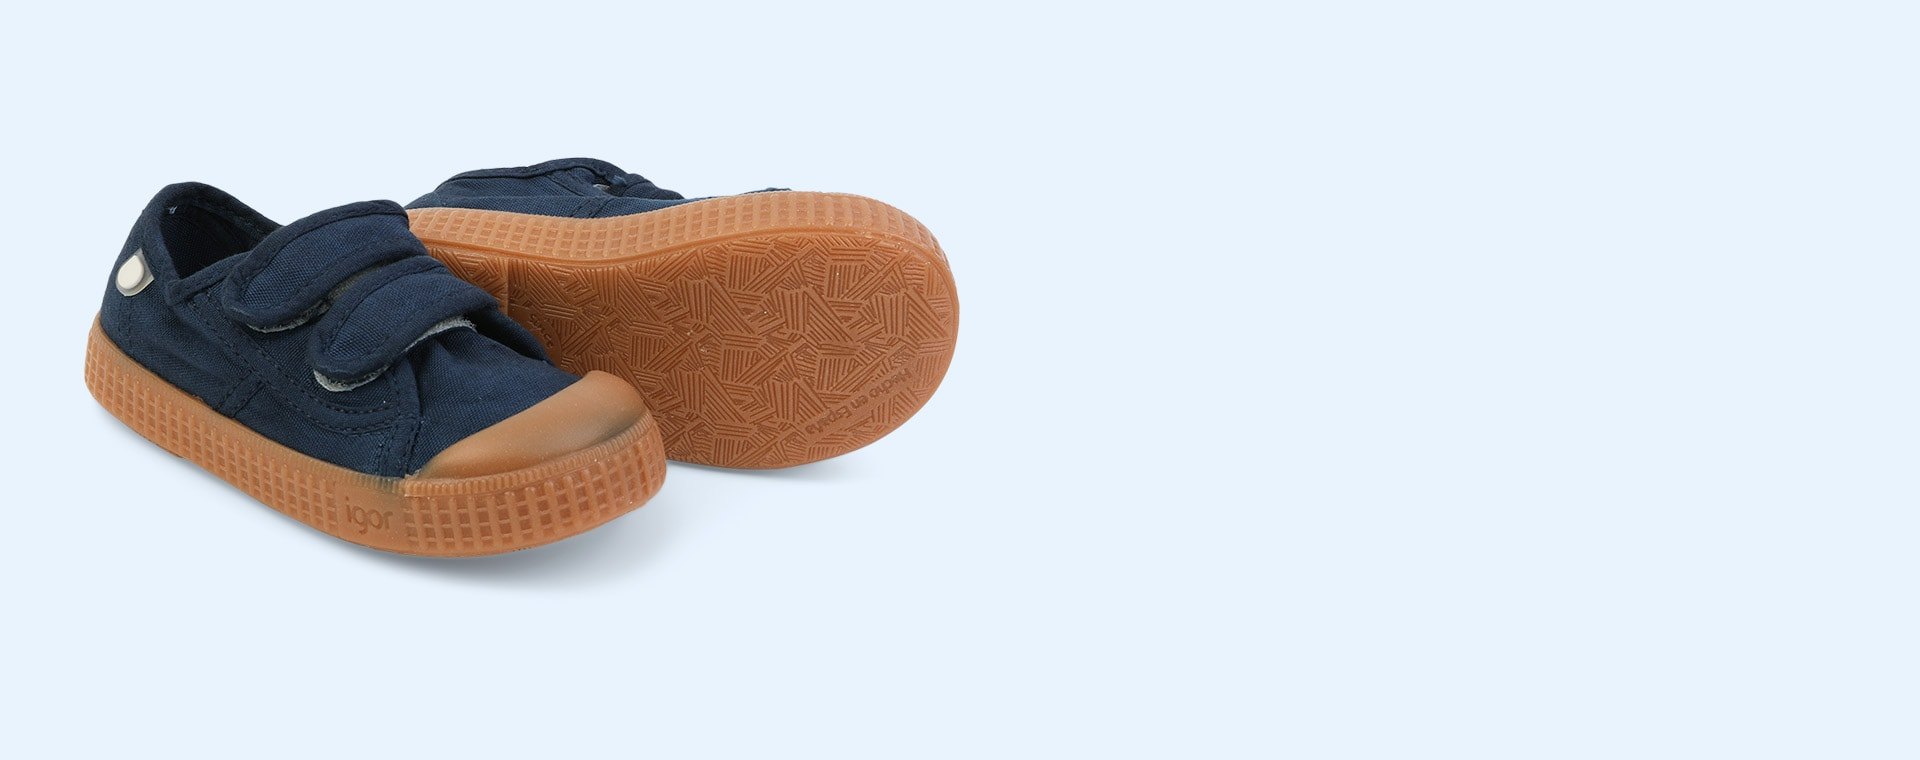 Marino igor Berri Velcro Caramelo